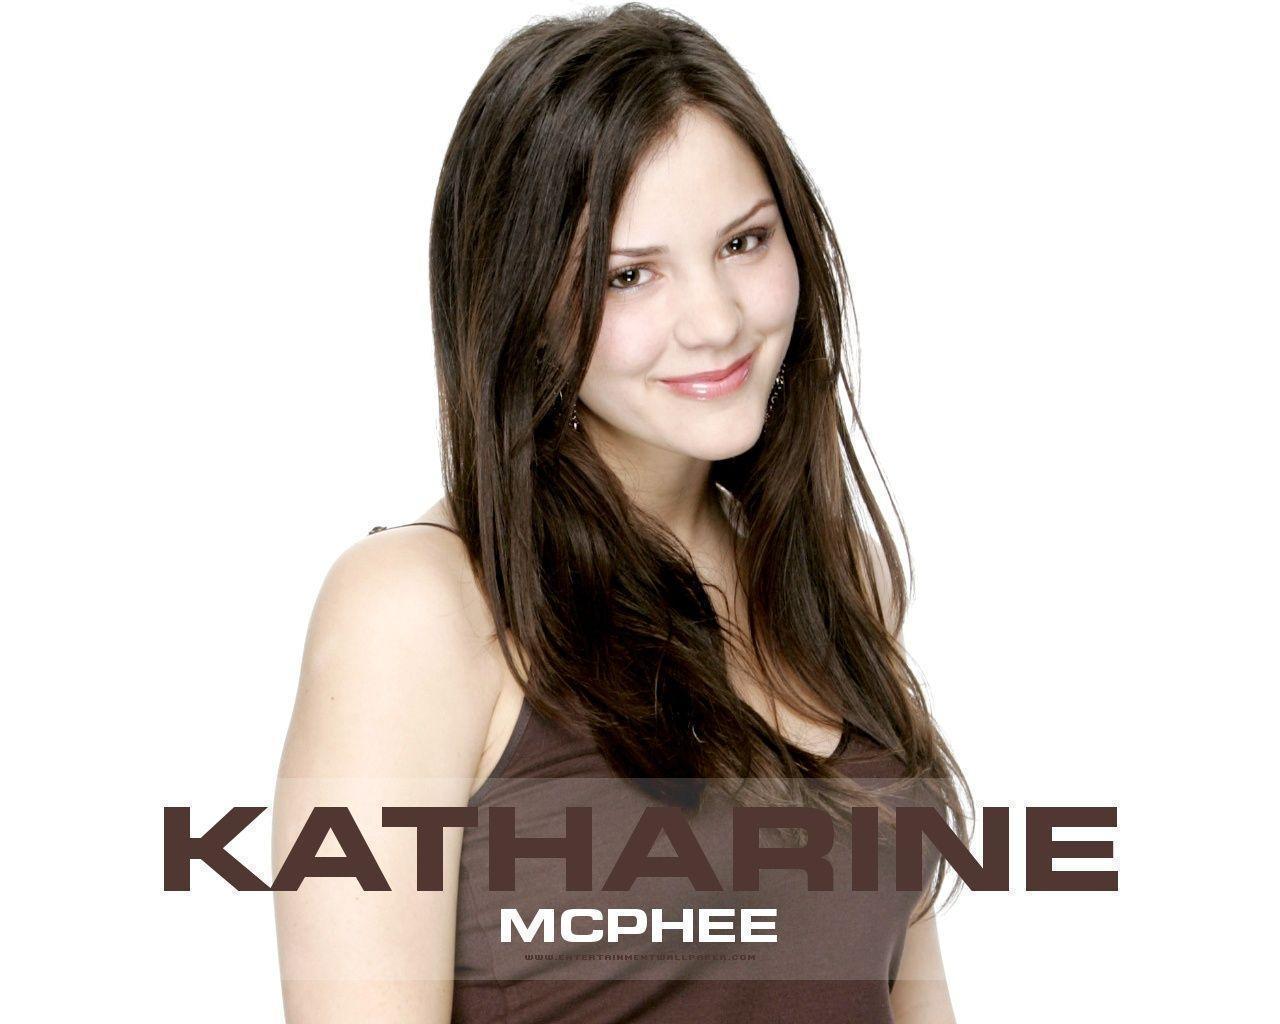 singers wallpaper katharine mcphee - photo #33